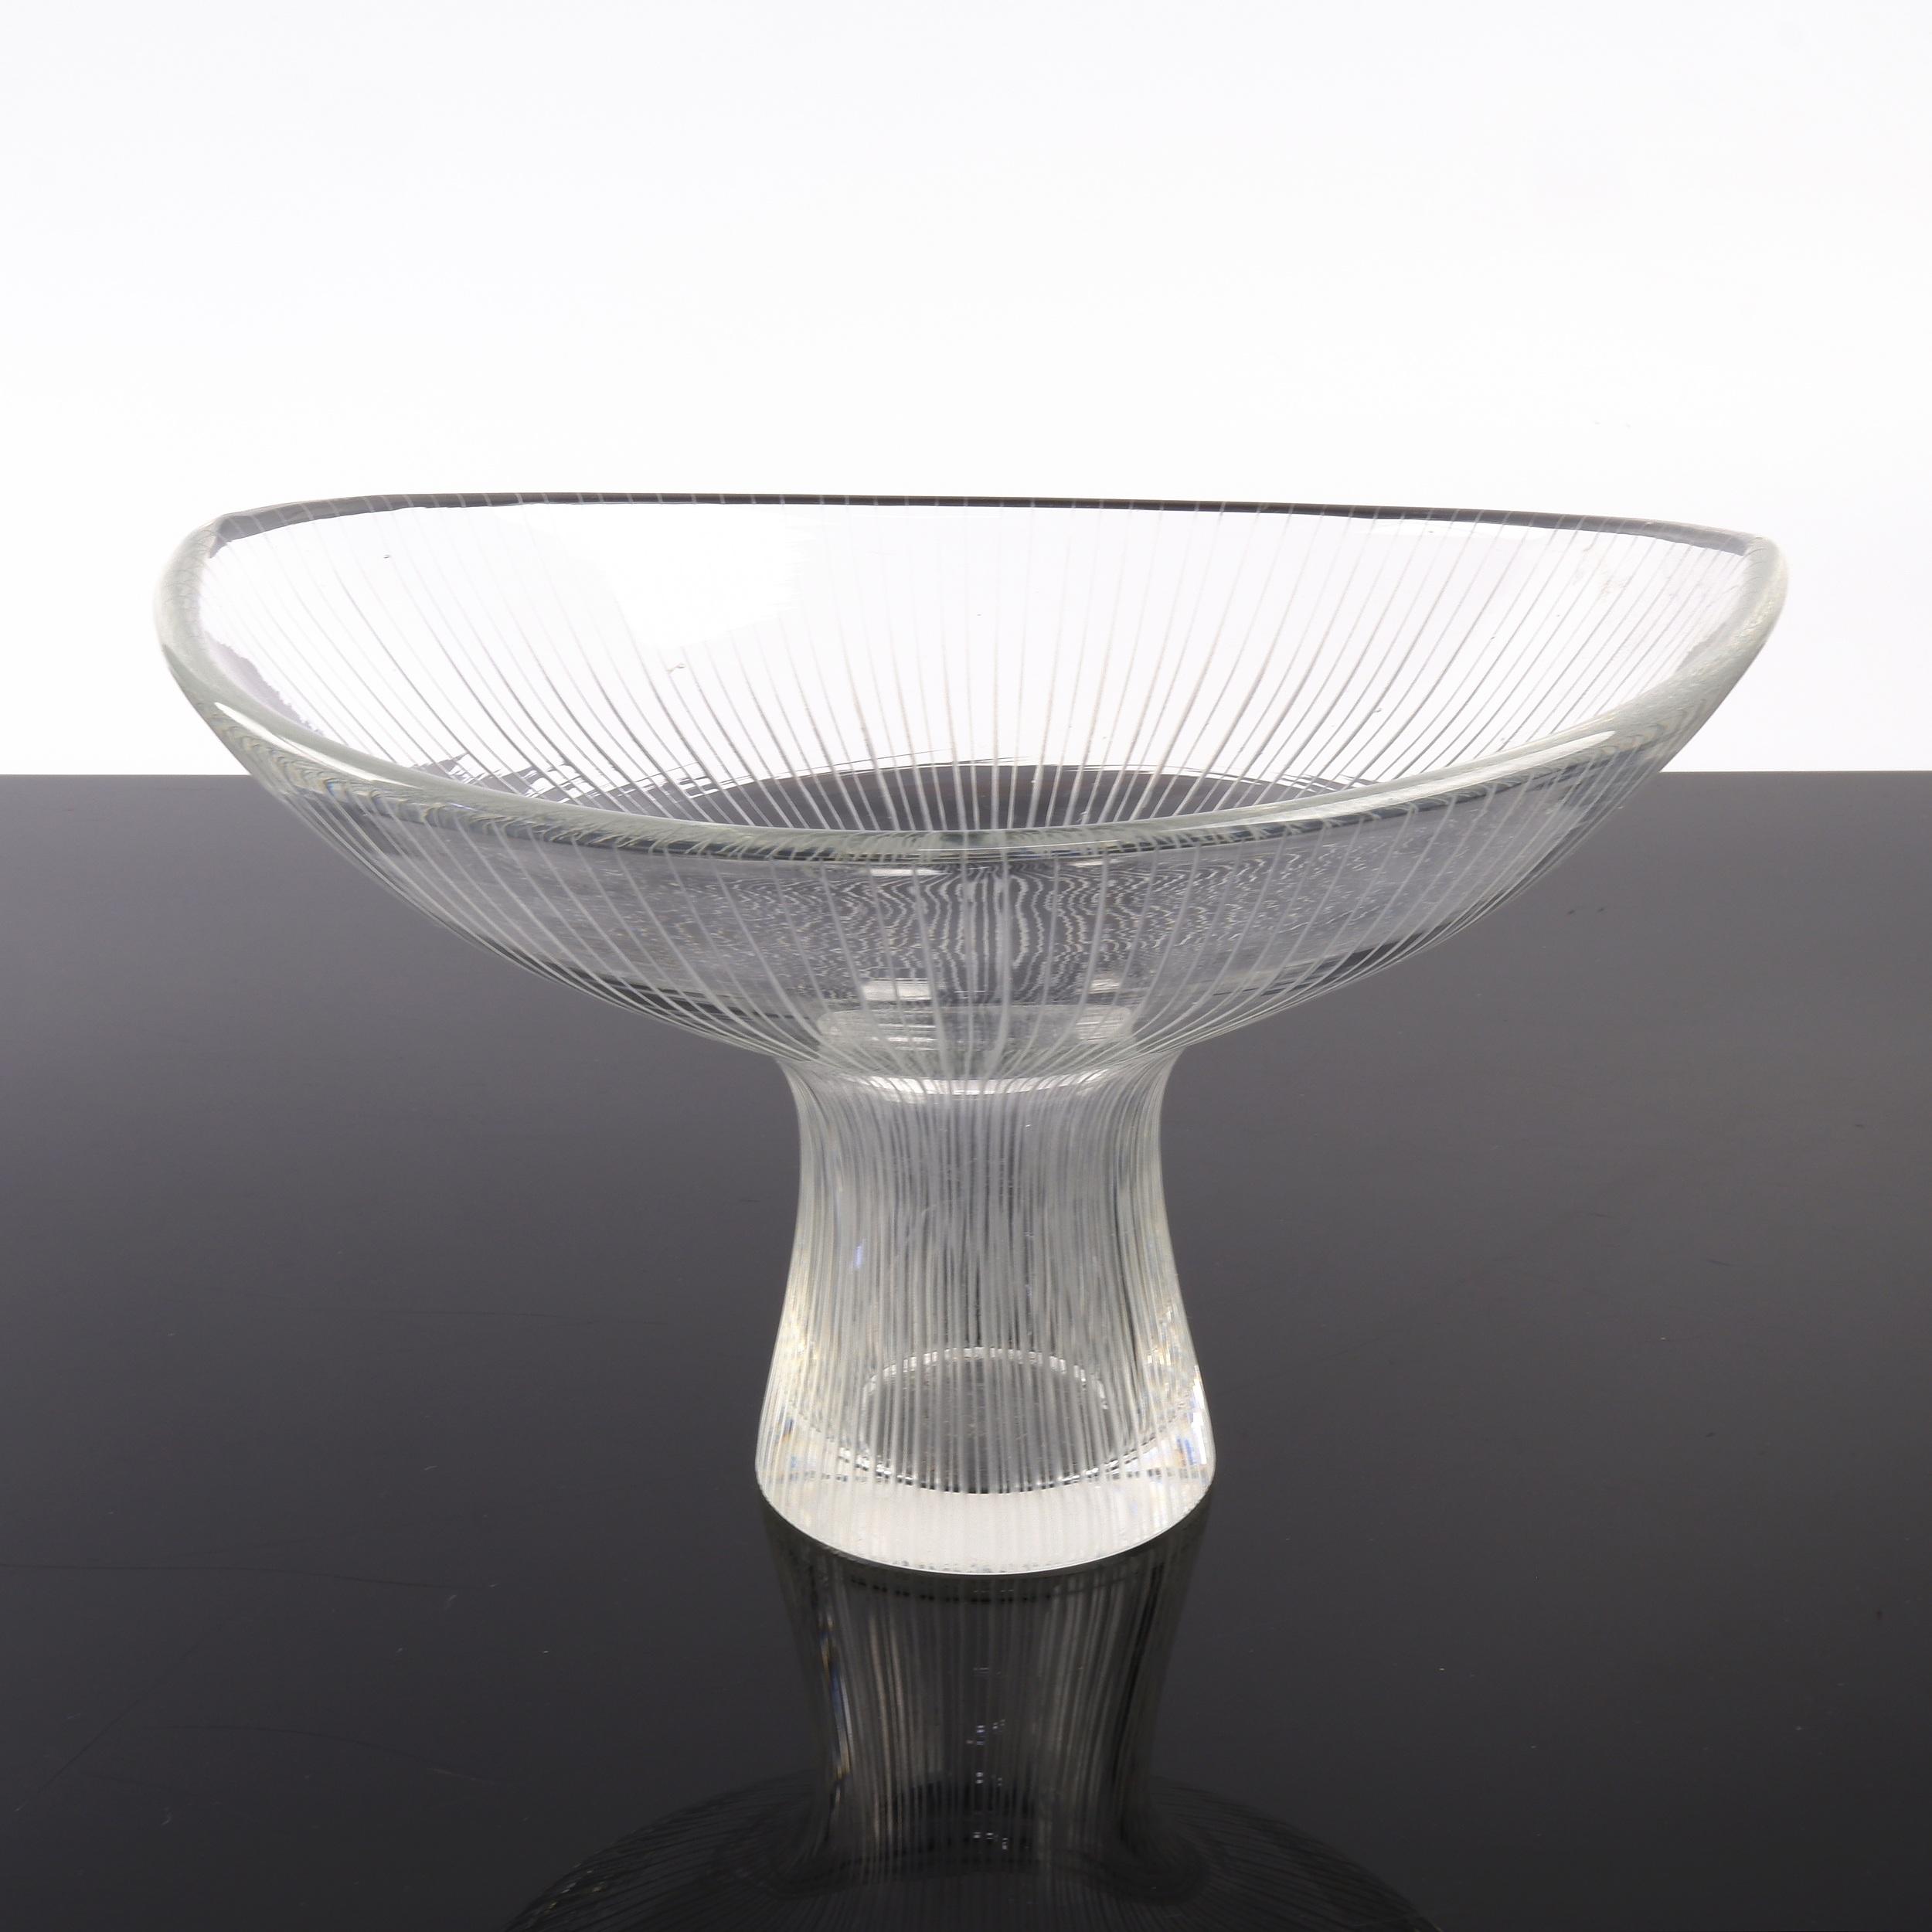 'Iittala Kantarelli Pedestal Vase Designed by Tapio Wirkkala Circa 1950s, Model 3532'